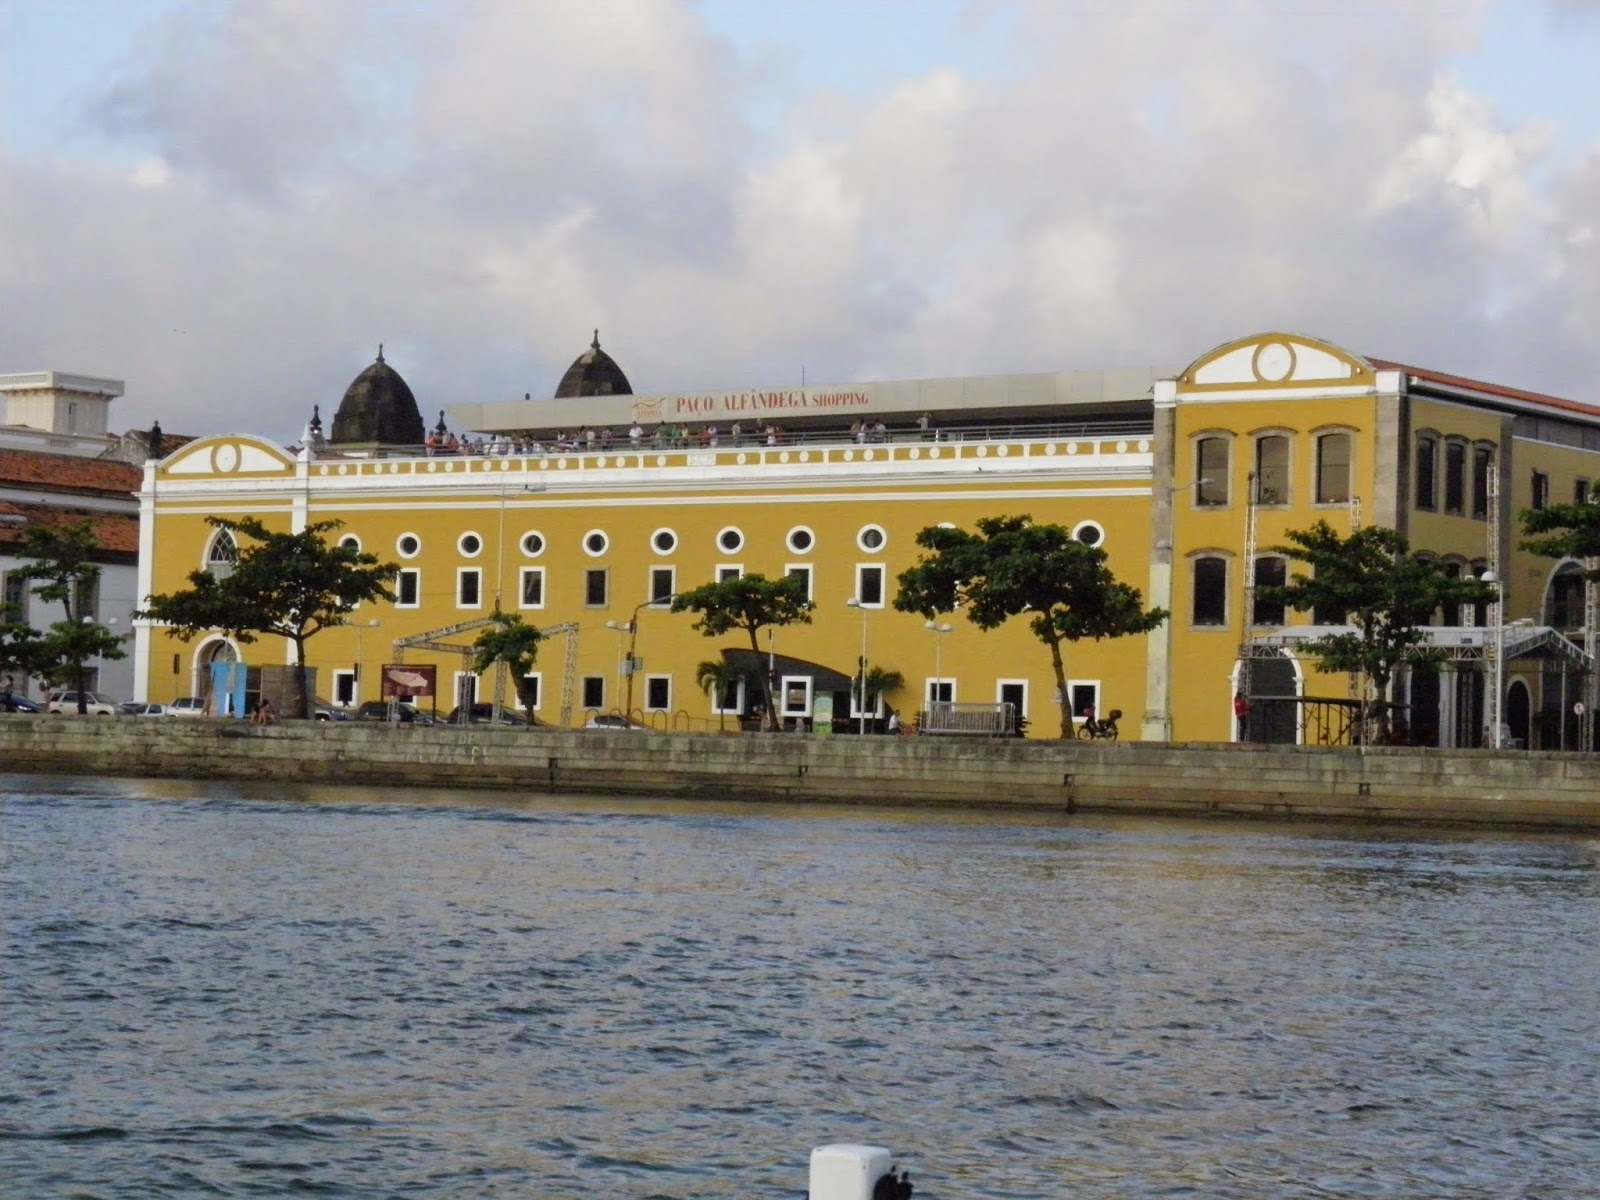 RECIFE; TURISMO; PASSEIO DE BARCO; PASSEIO DE CATAMARÃ; RIO CAPIBARIBE; SHOPPING PAÇO ALFANDEGA